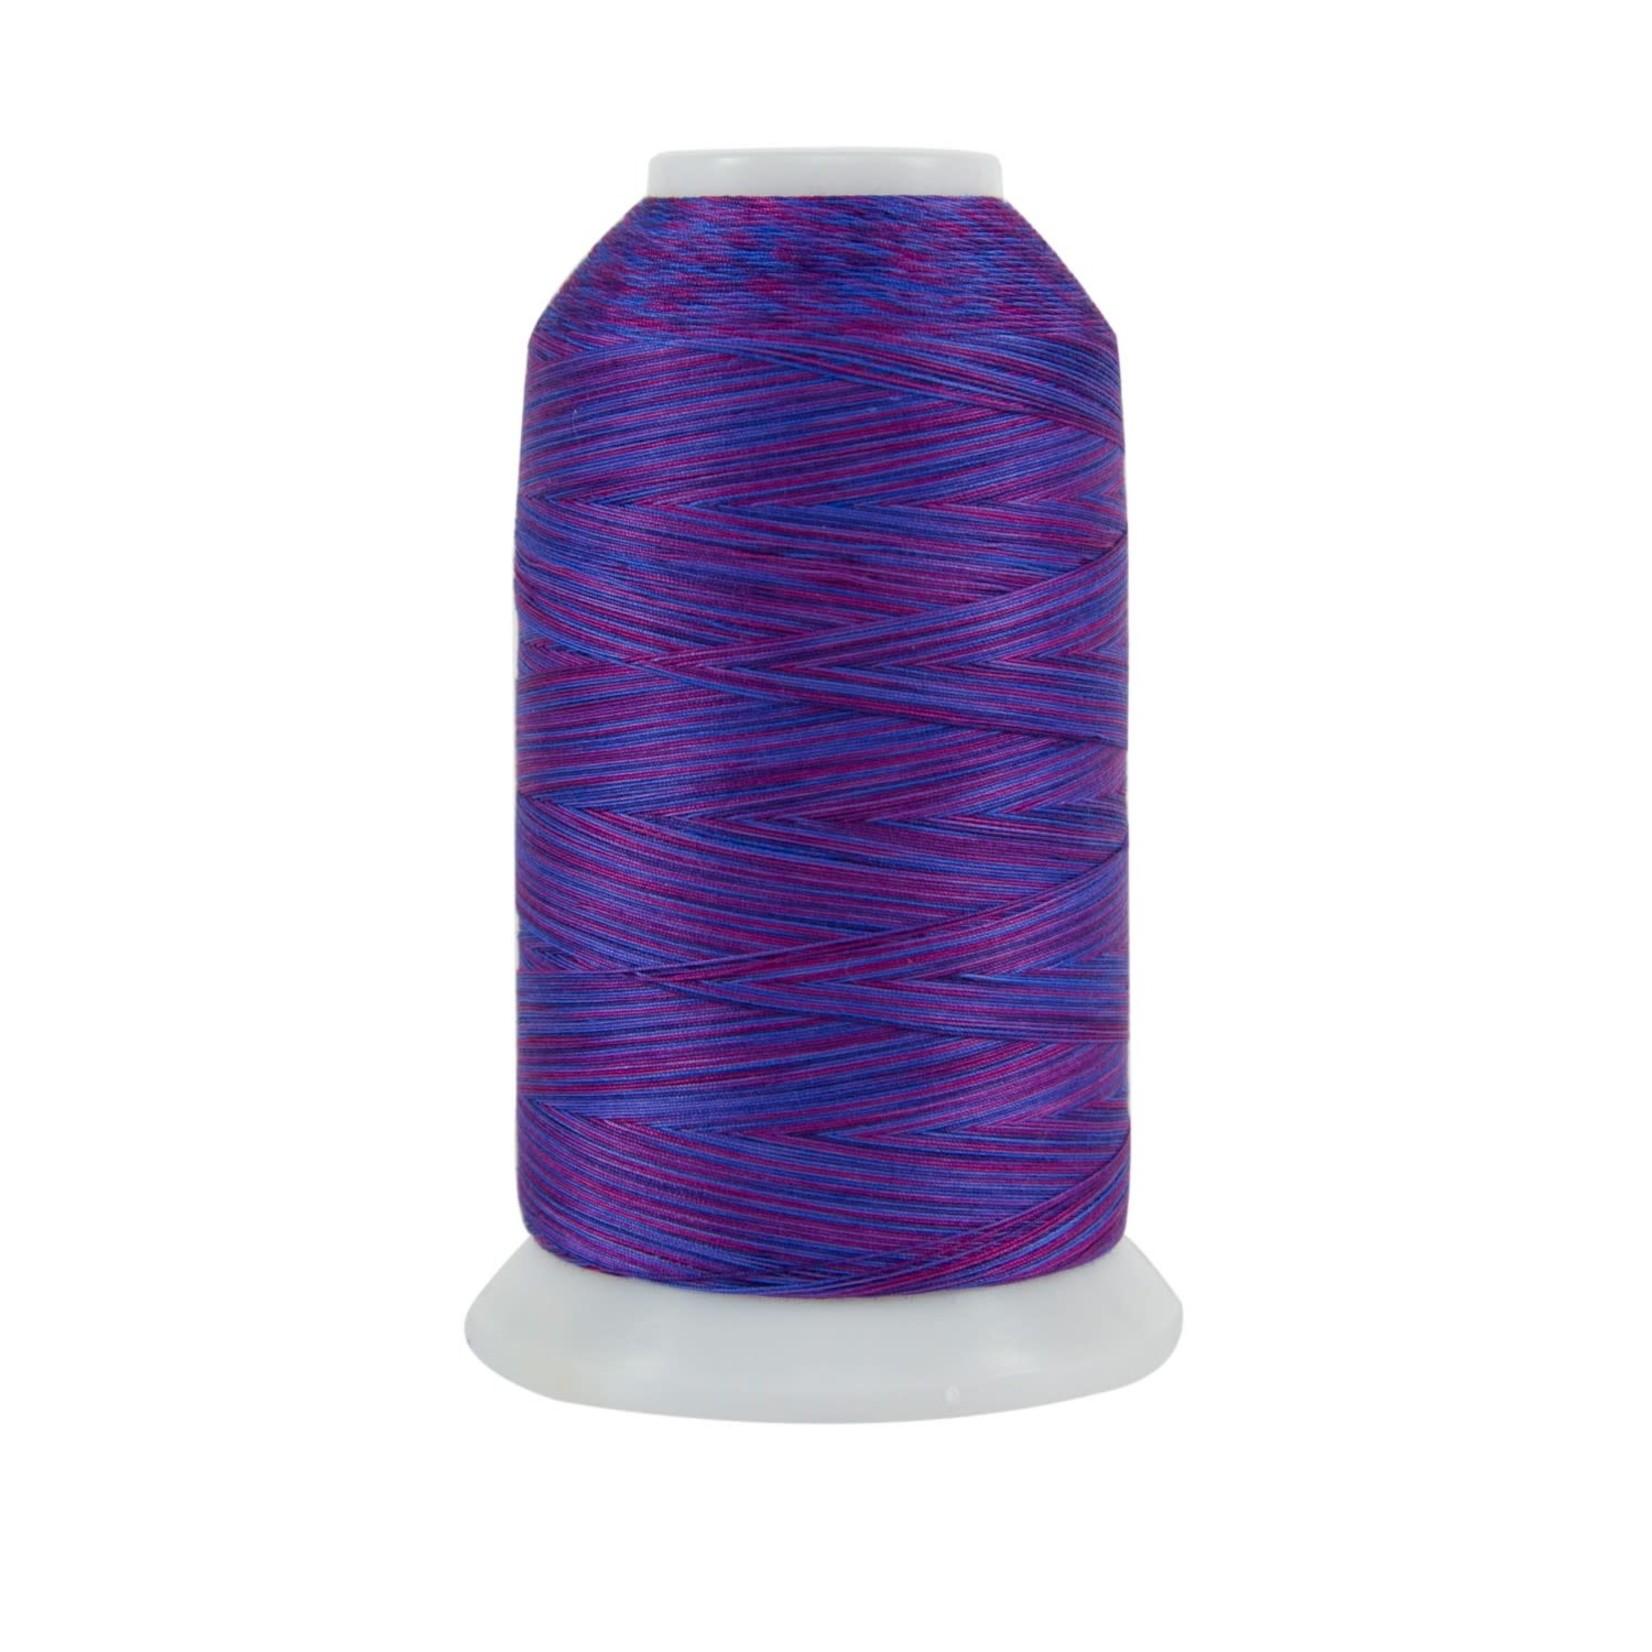 Superior Threads King Tut - #40 - 1828 m - 0938 Luxorious